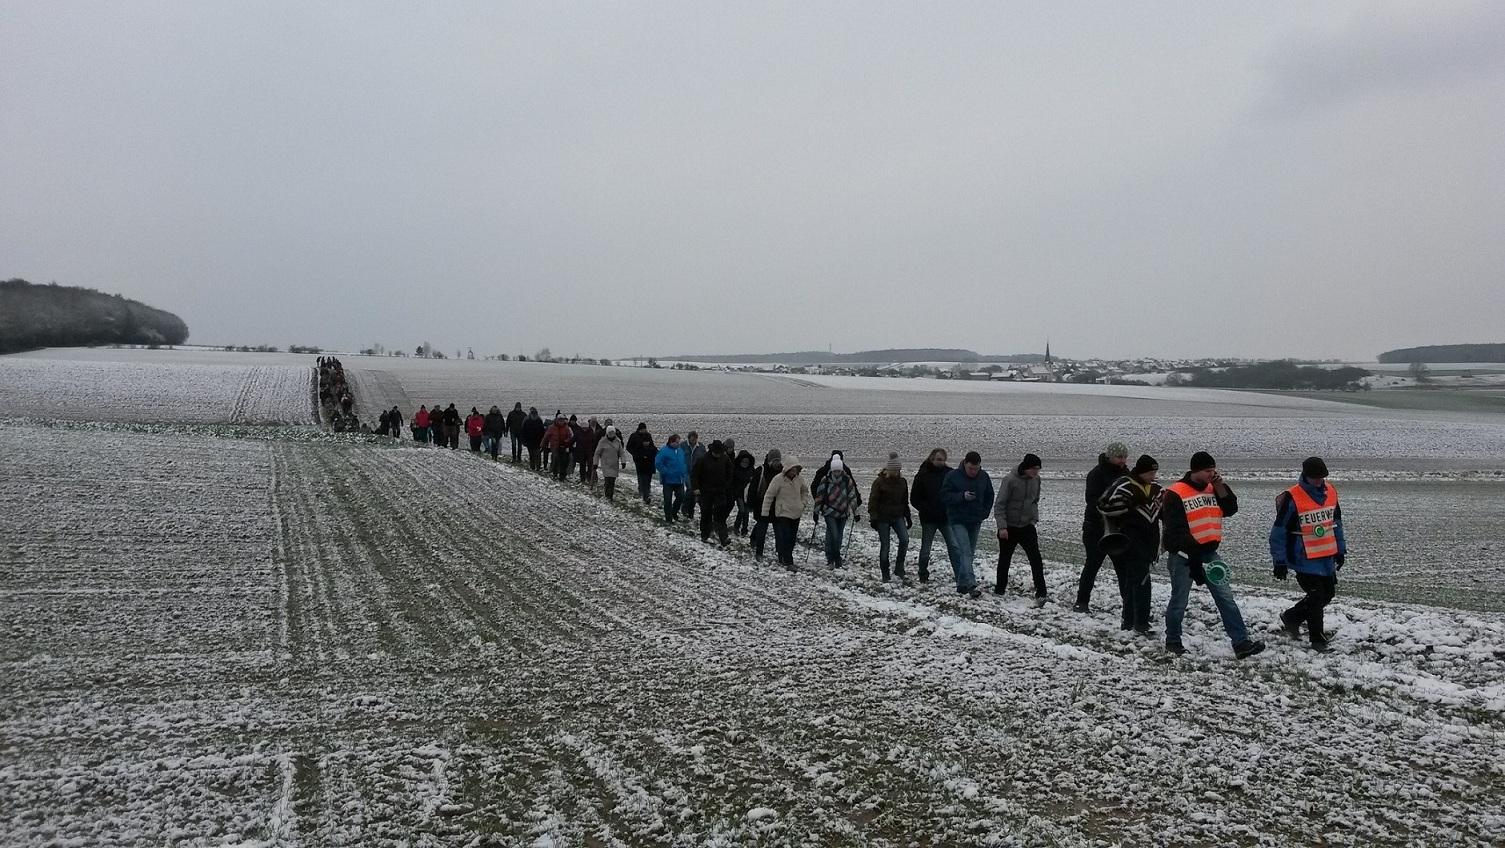 Bild DJK Burghausen – Winterwanderung DV Kreisverband Schweinfurt